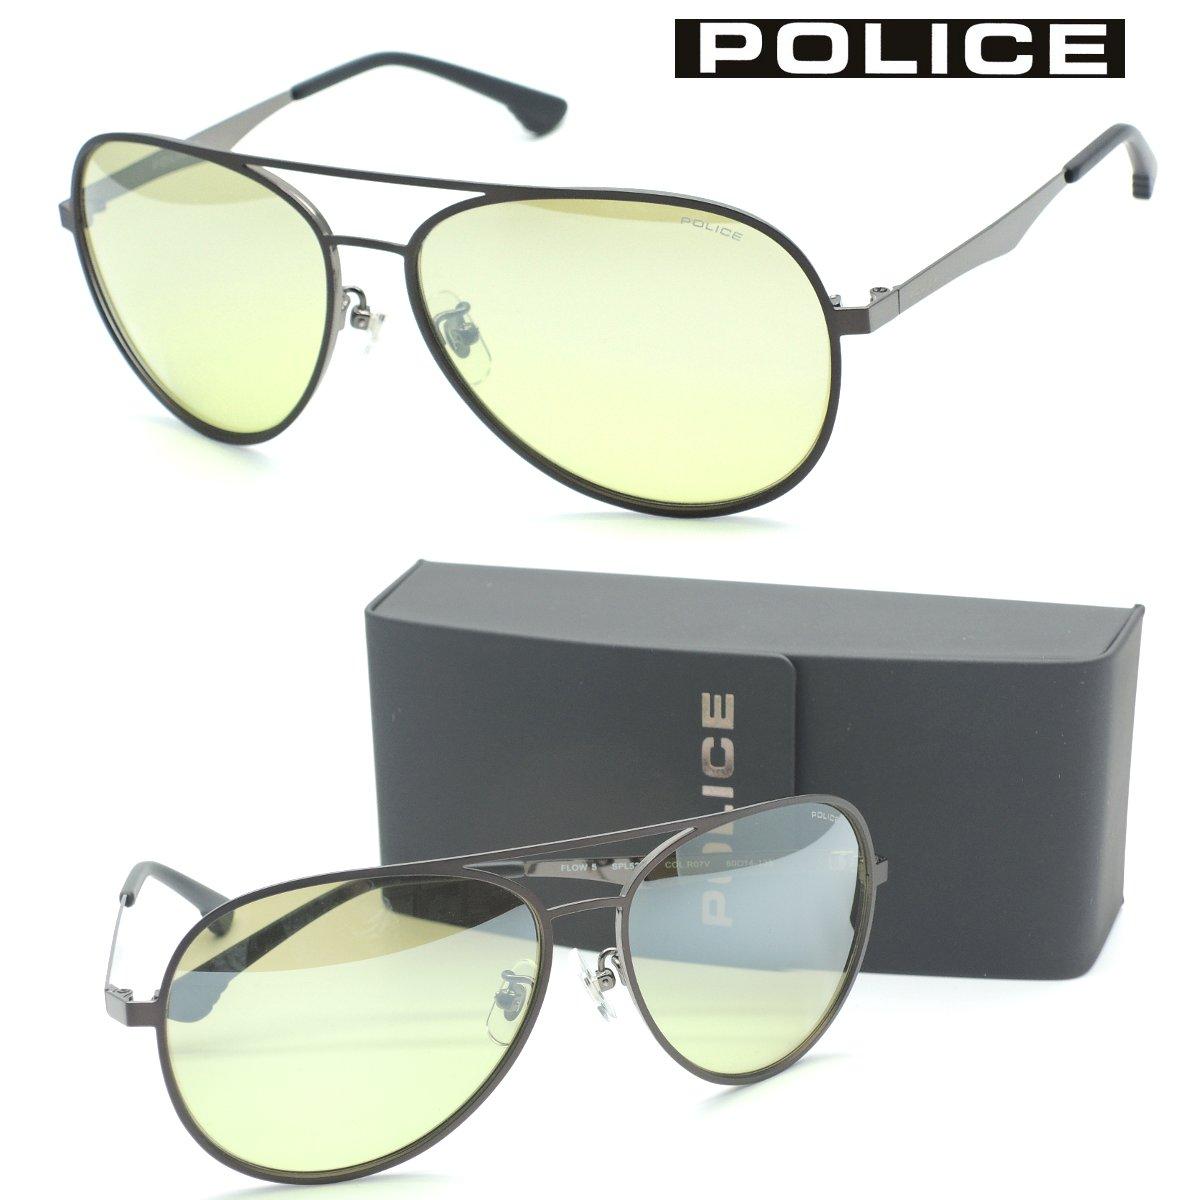 【POLICE】ポリス サングラス SPL526J col.R07V【国内正規品】【店内全品送料無料】メンズ ユニセックス